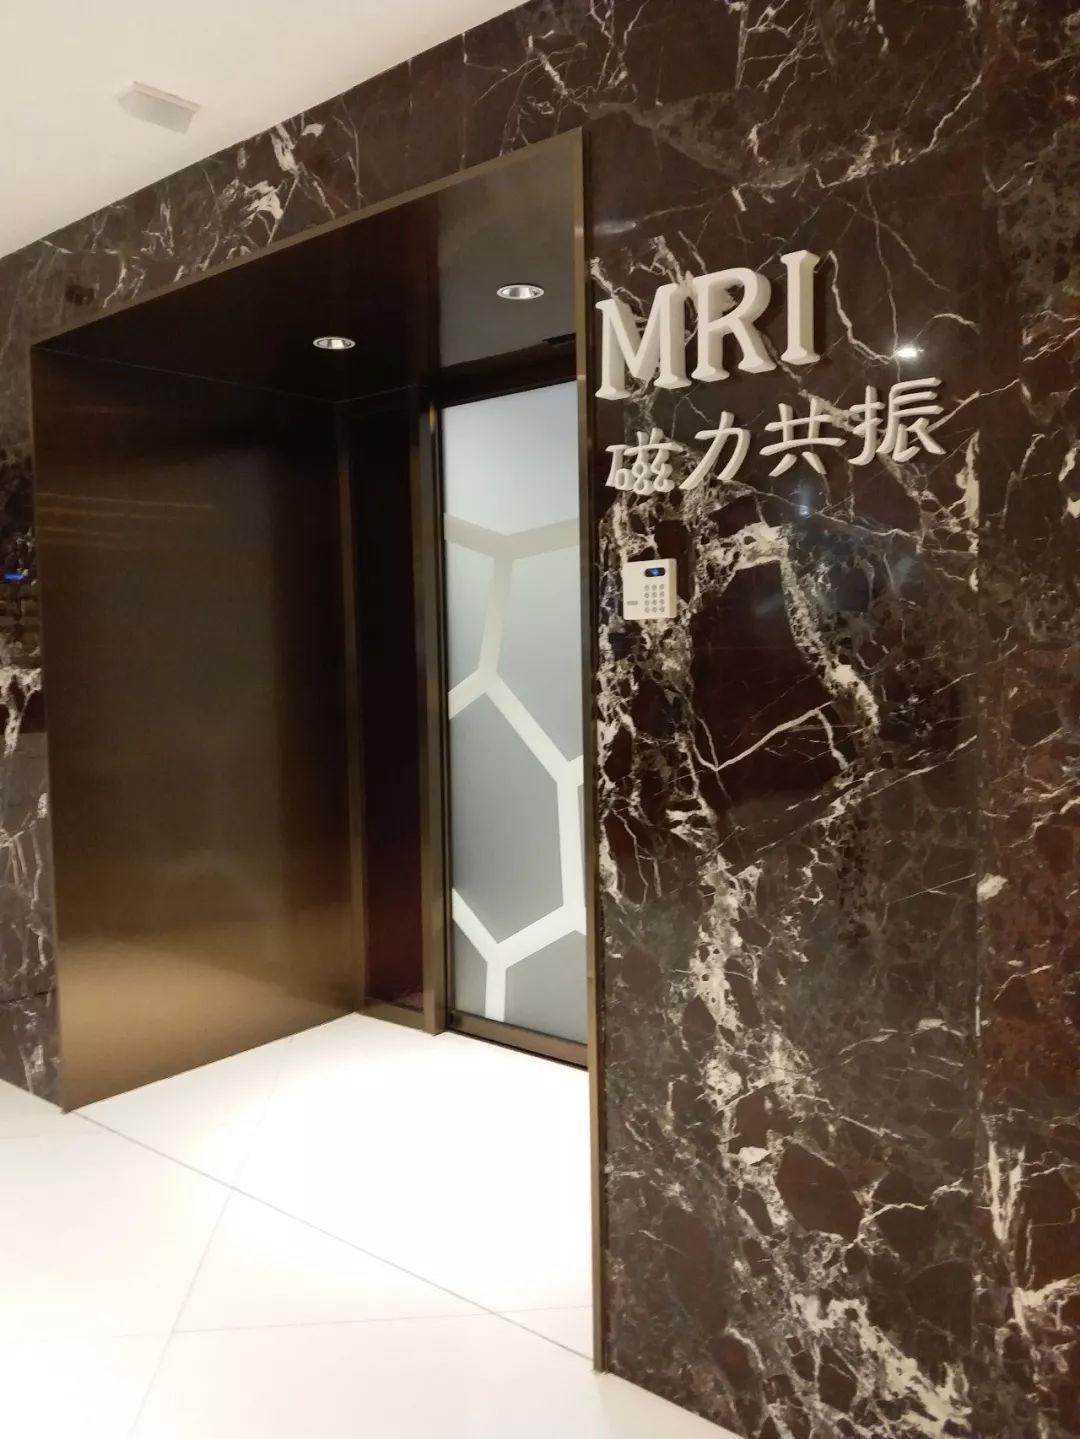 MRI磁力共振